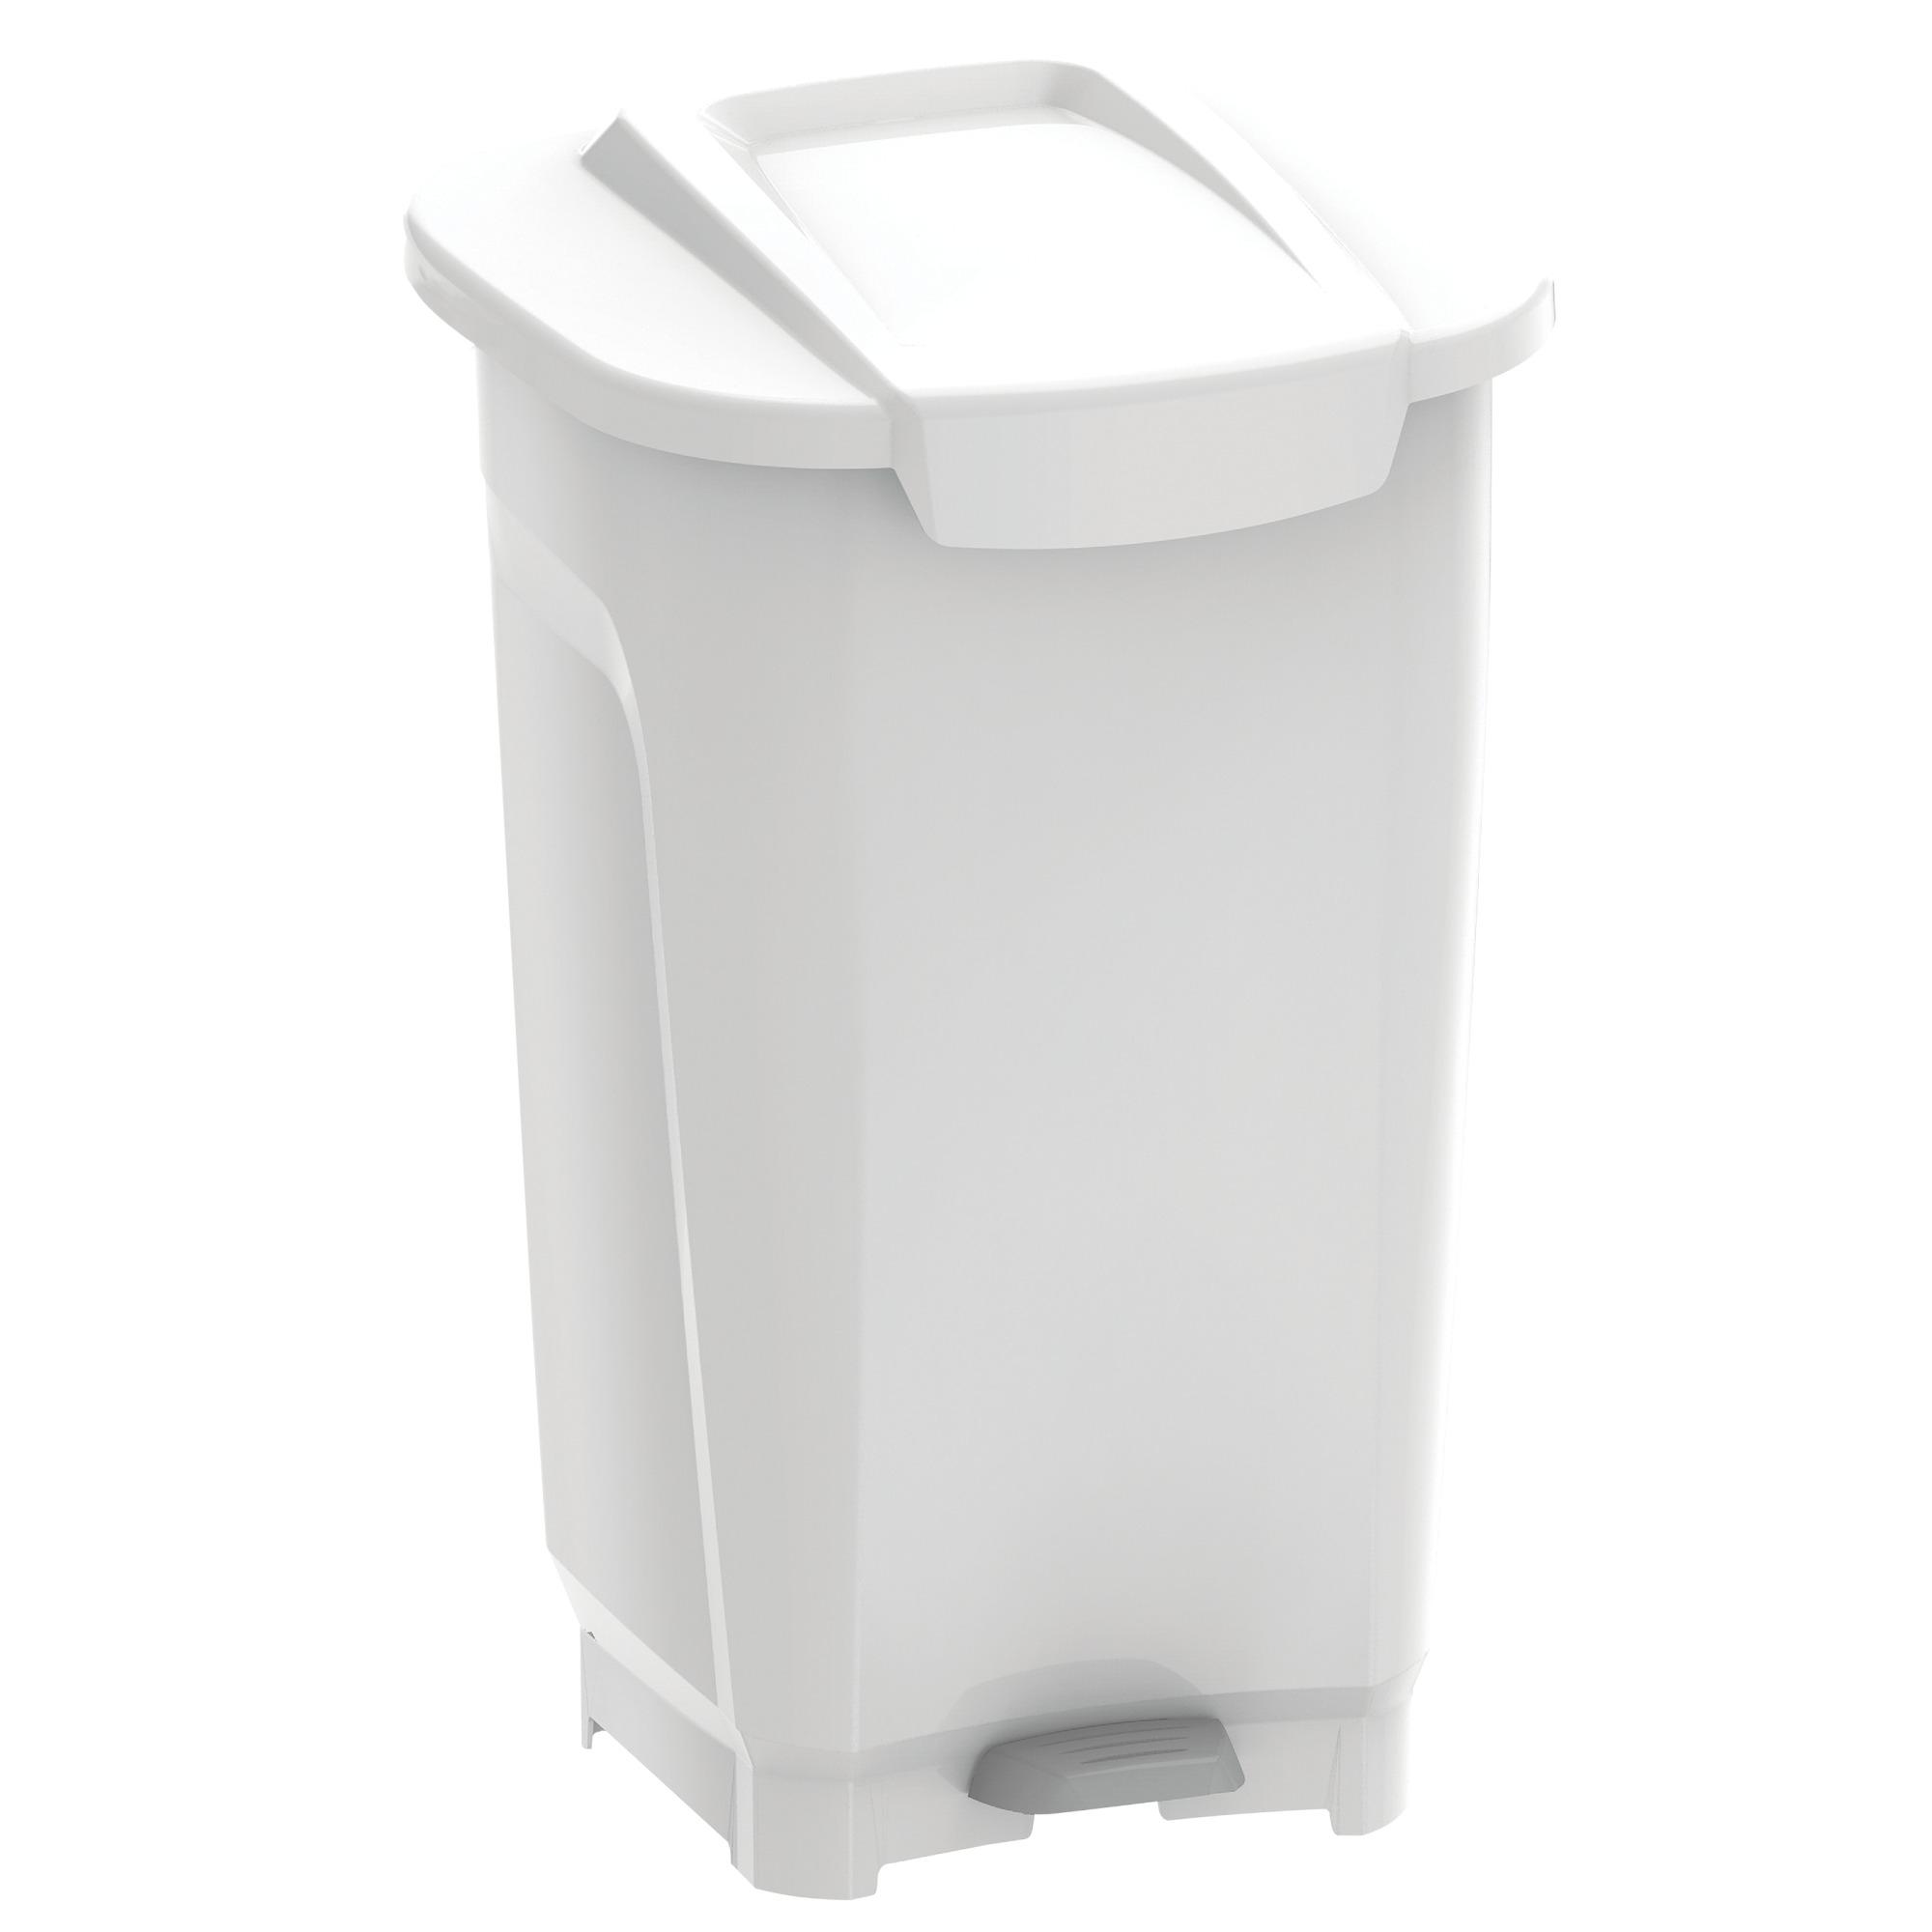 Lixeira de Plastico com Pedal 50L Branca - Tramontina